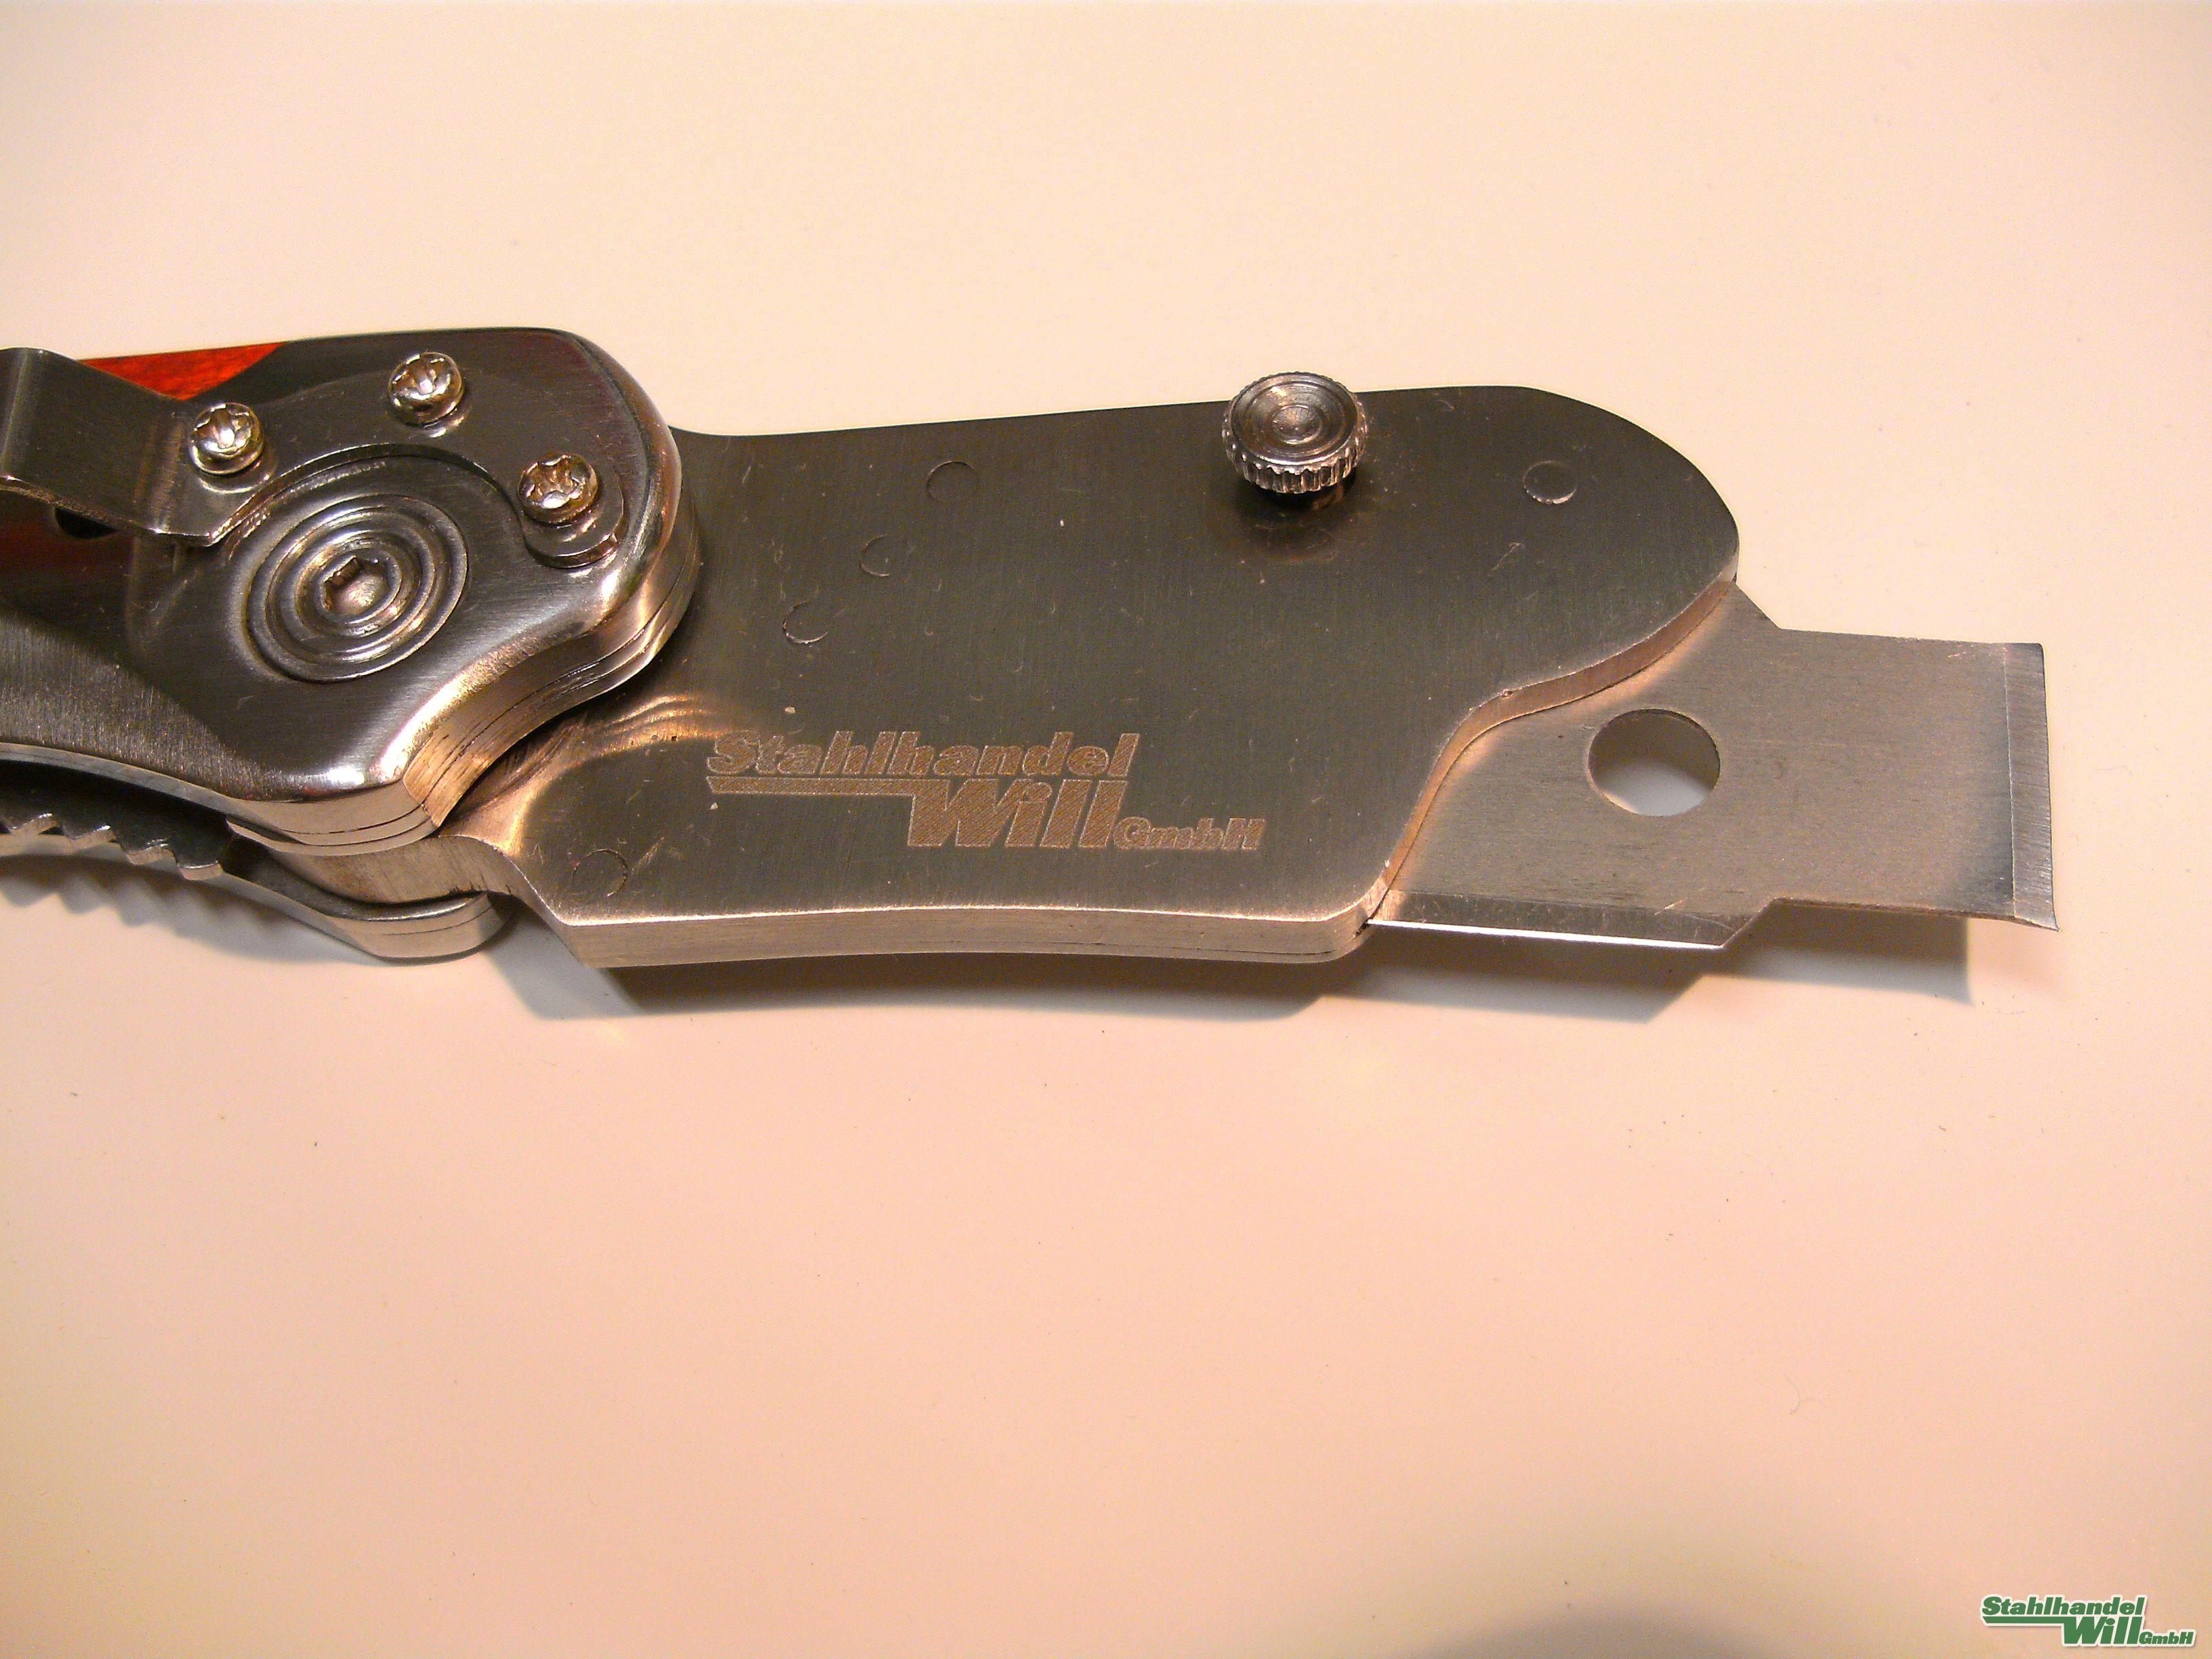 profimesser messer cuttermesser multitool handwerker taschenmesser geschenk. Black Bedroom Furniture Sets. Home Design Ideas